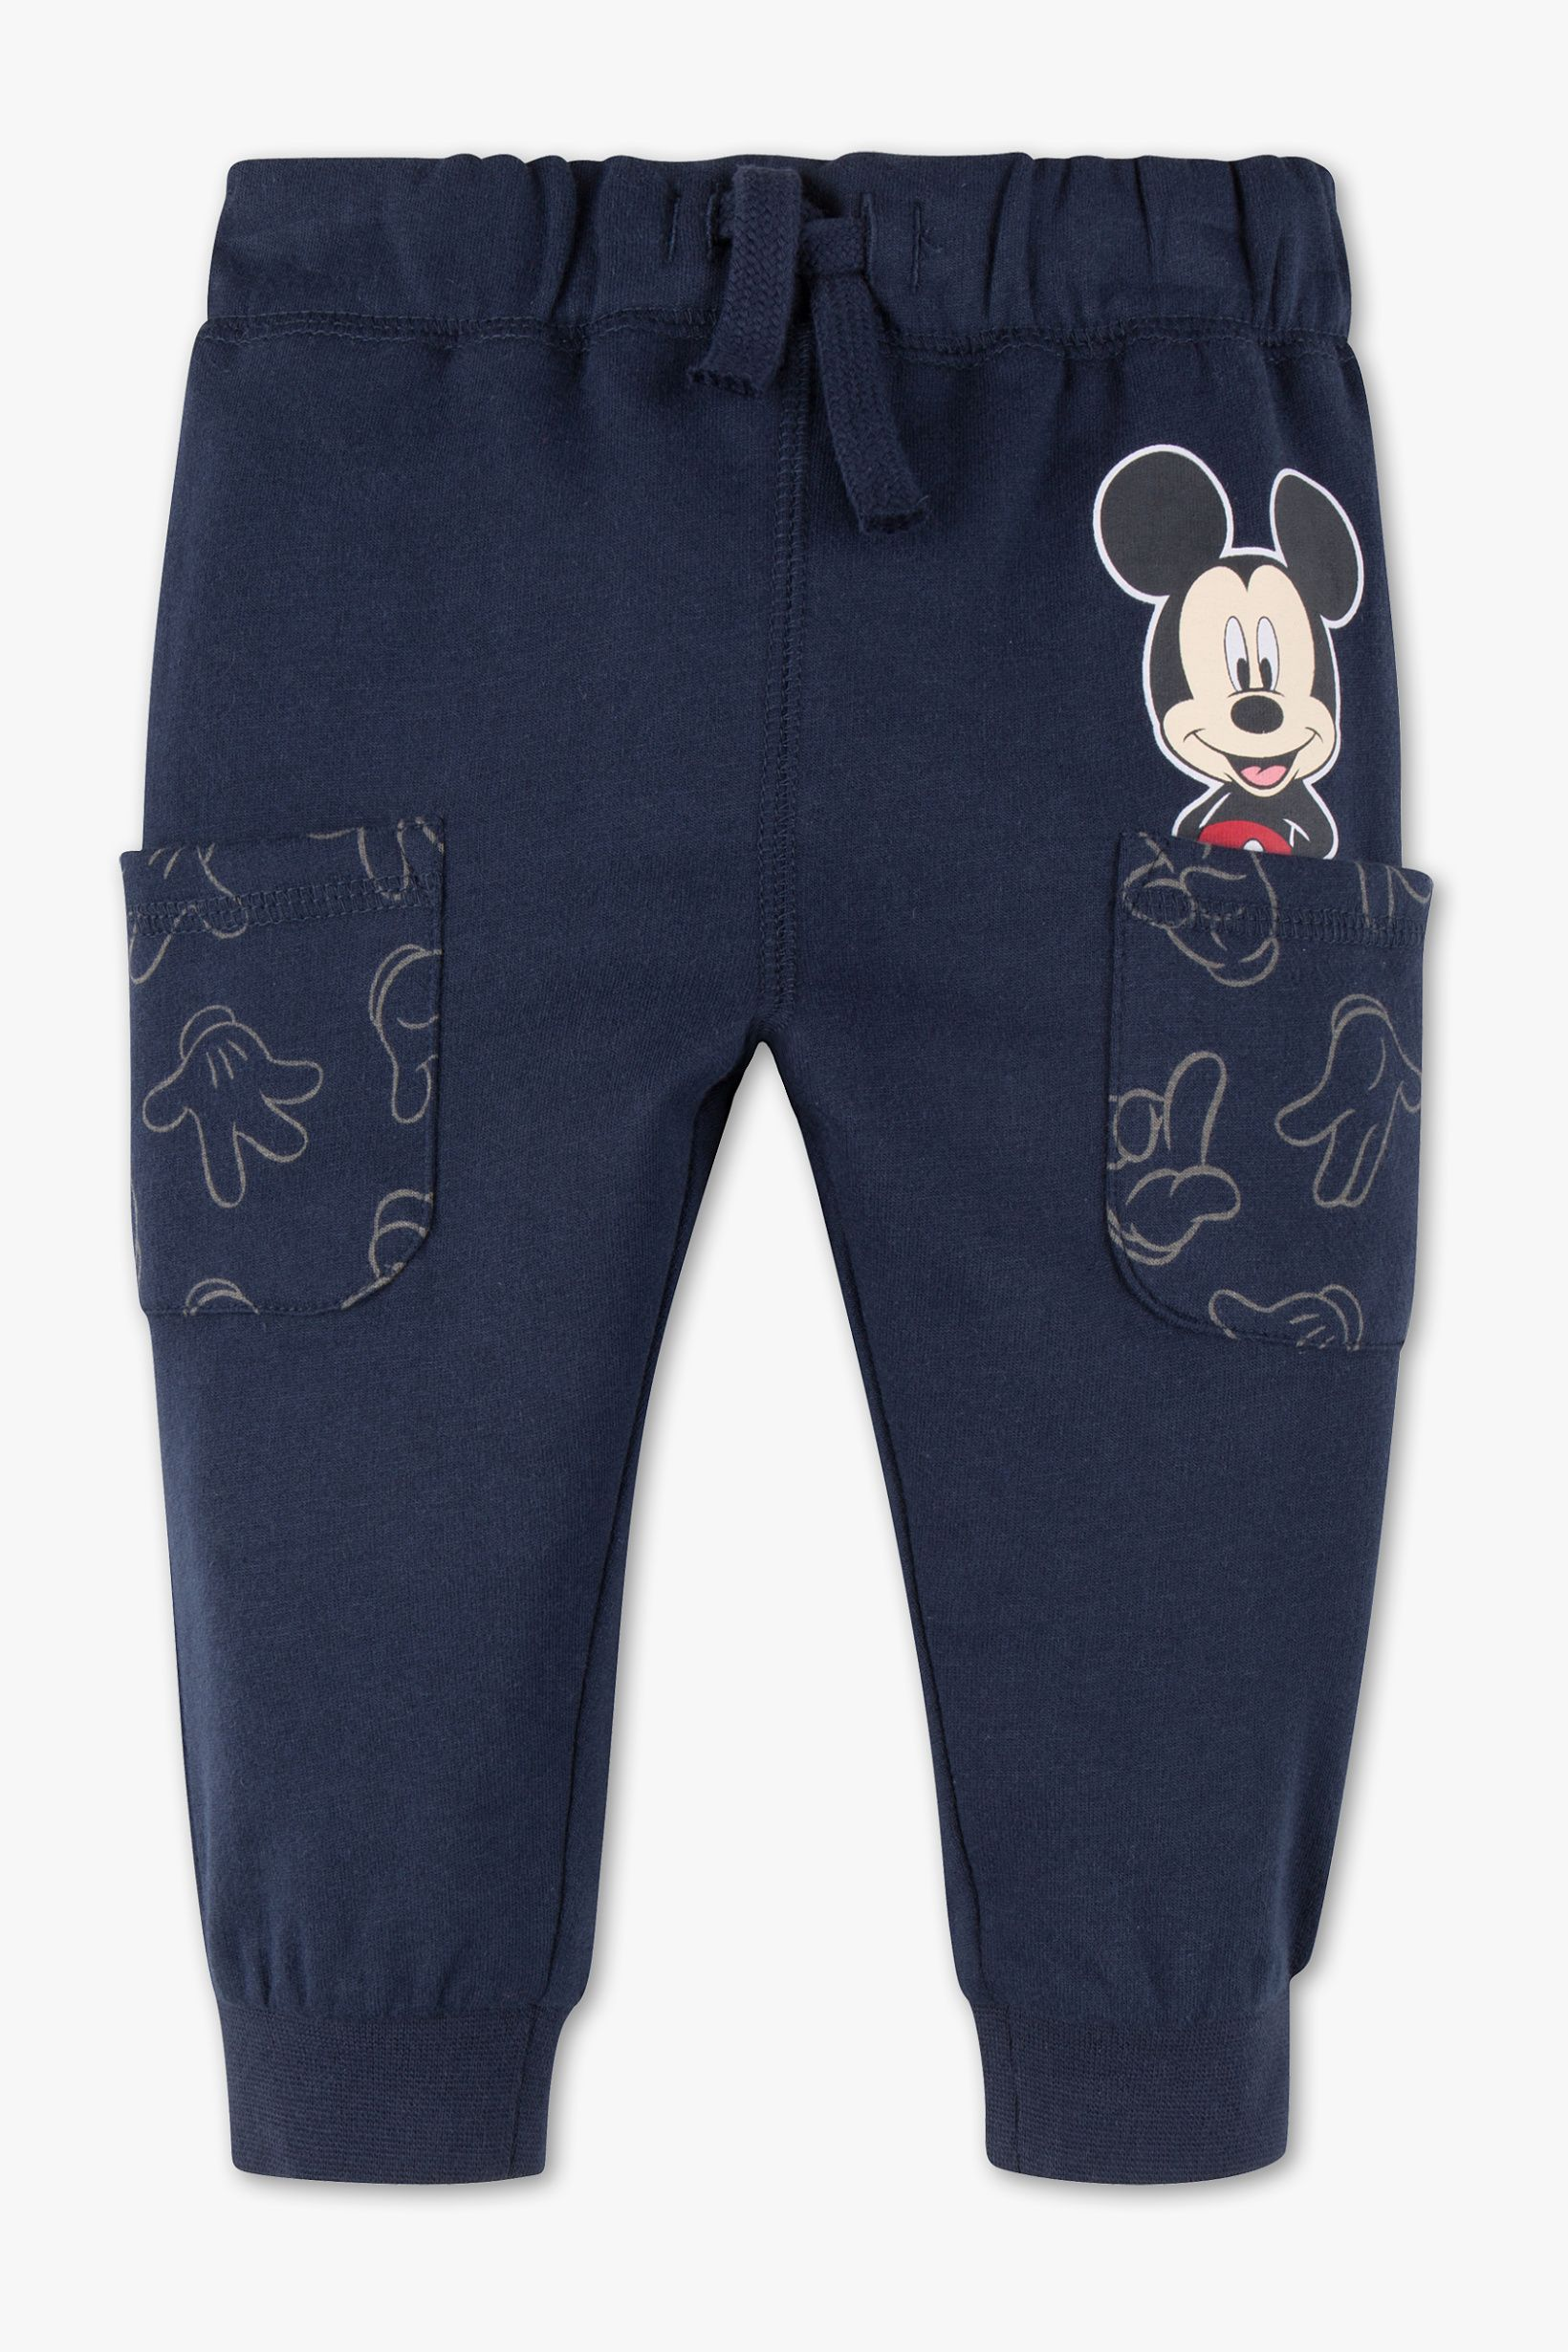 26e6ef475 Disney Baby Disney - Pantalón de deporte para bebé - Algodón ...